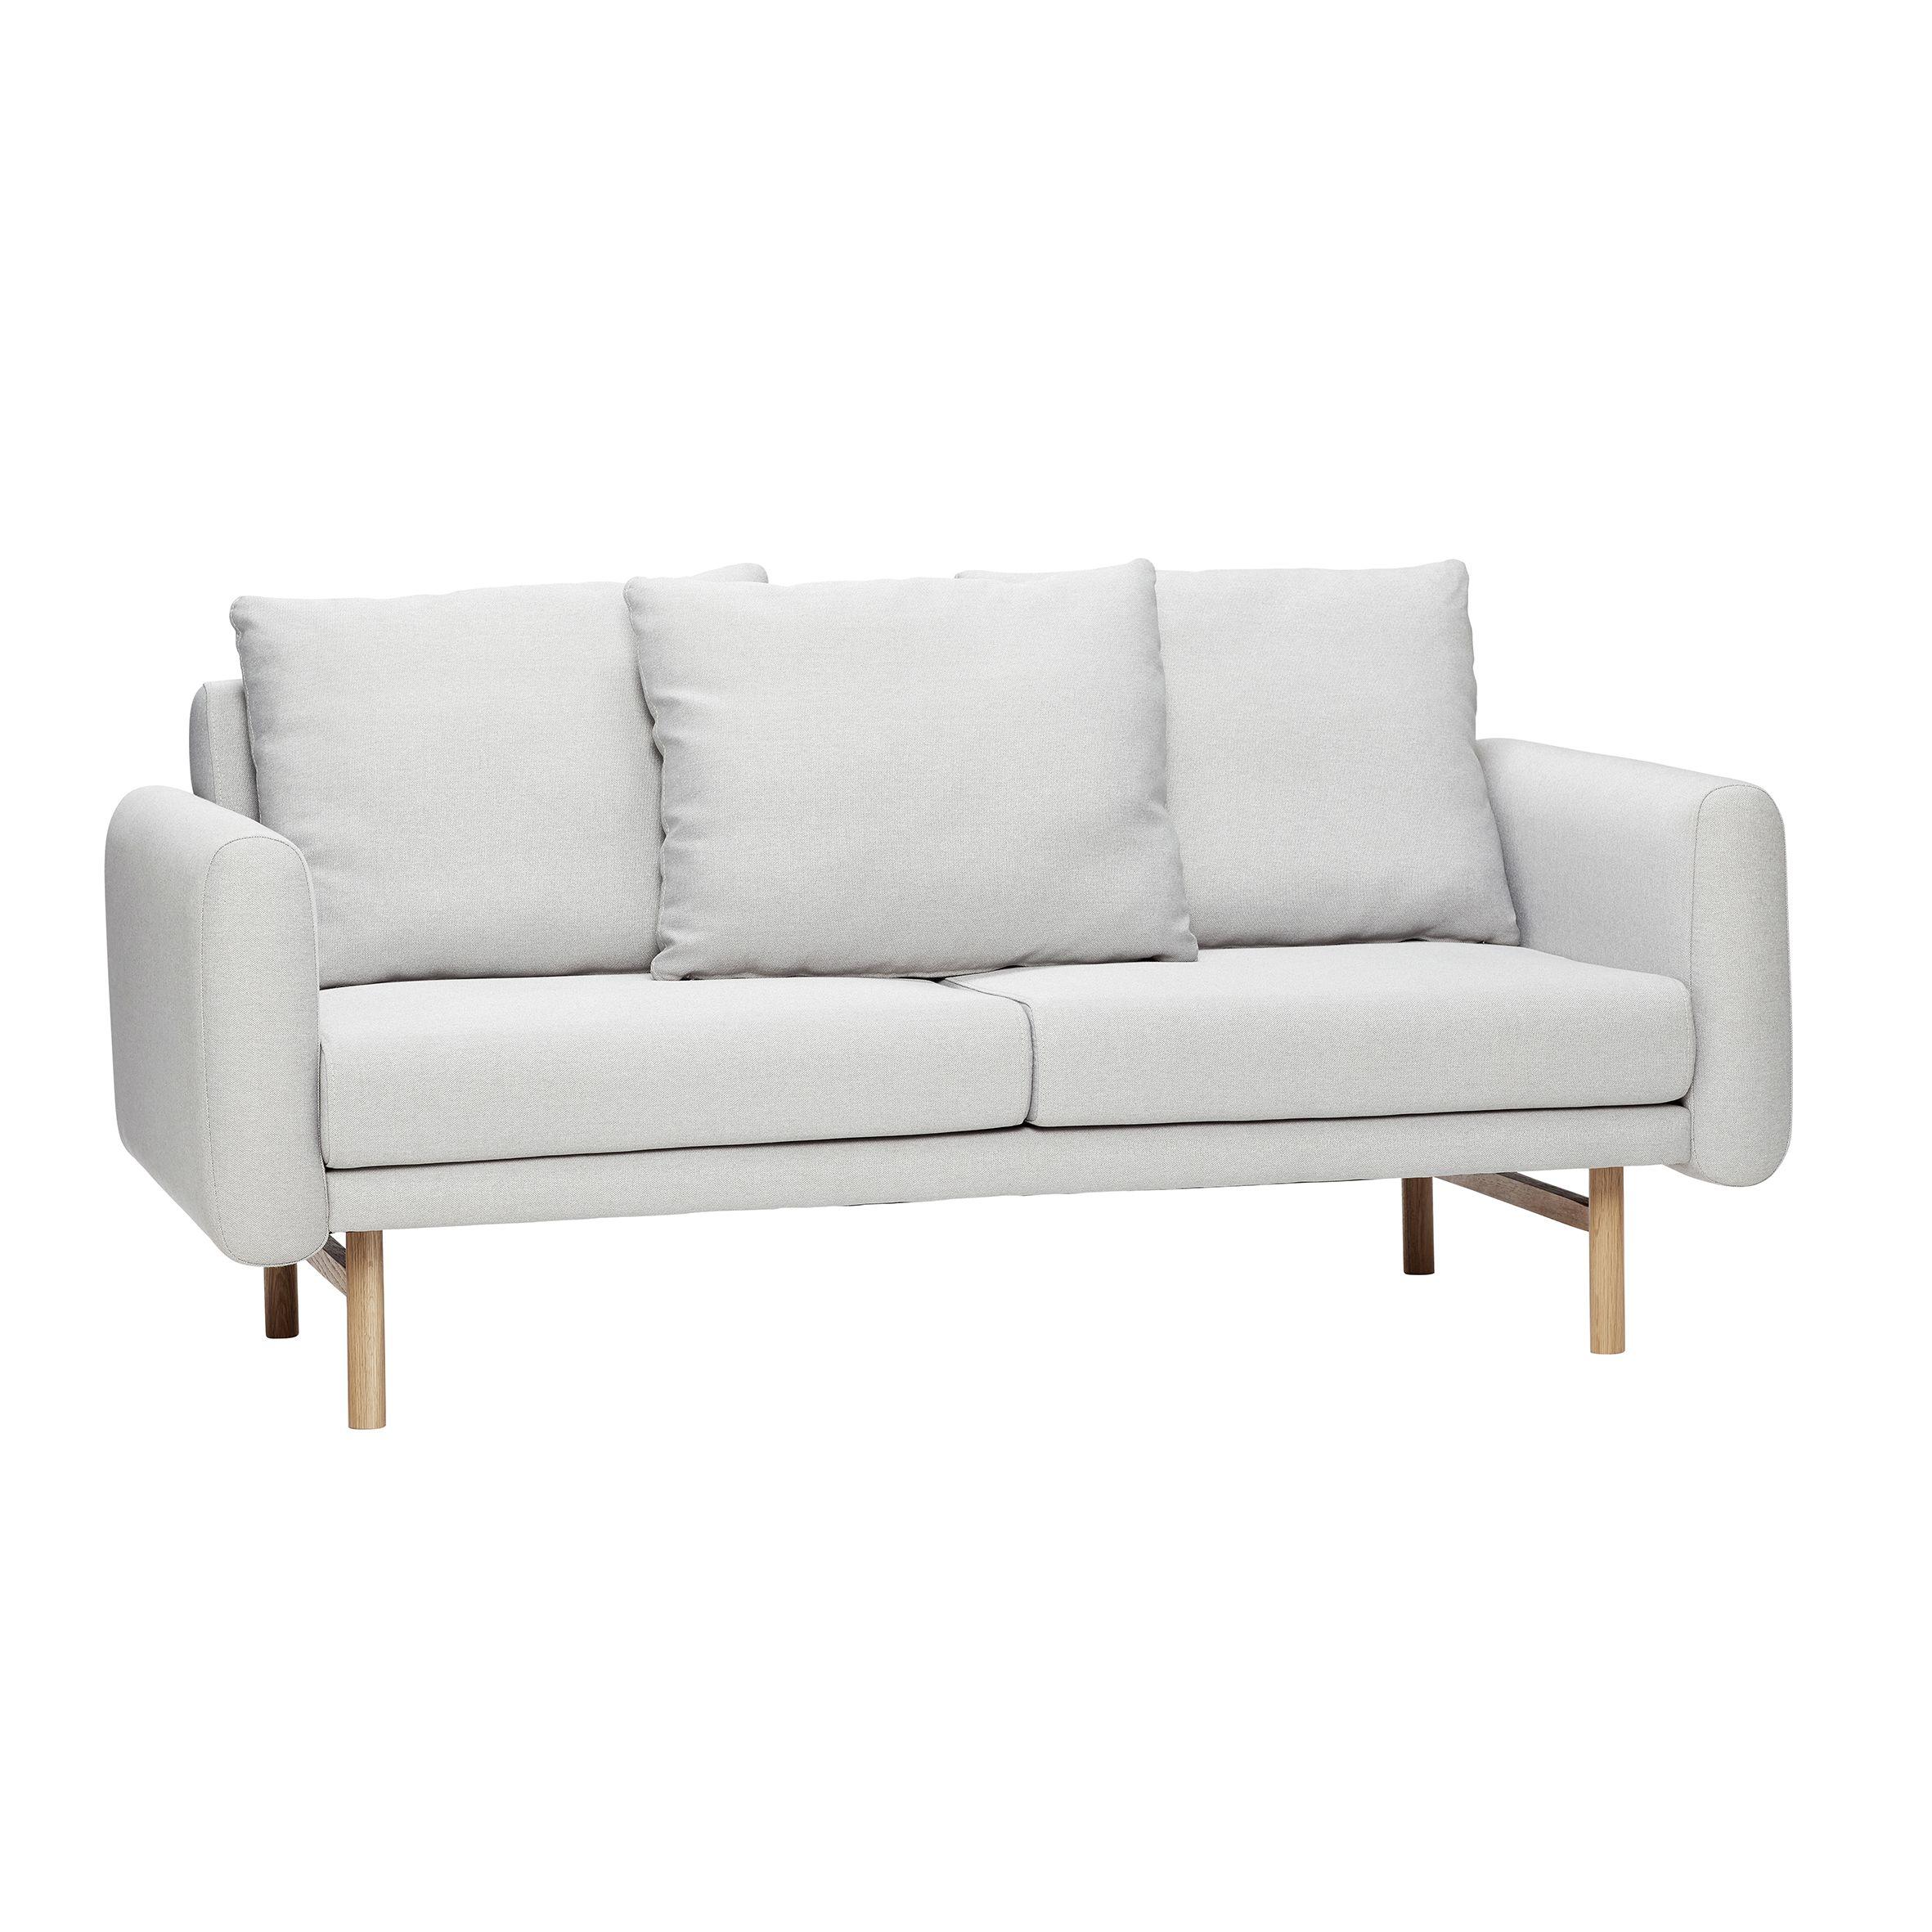 Astonishing Light Grey Fabric Sofa With Wooden Legs For 2 People Light Frankydiablos Diy Chair Ideas Frankydiabloscom